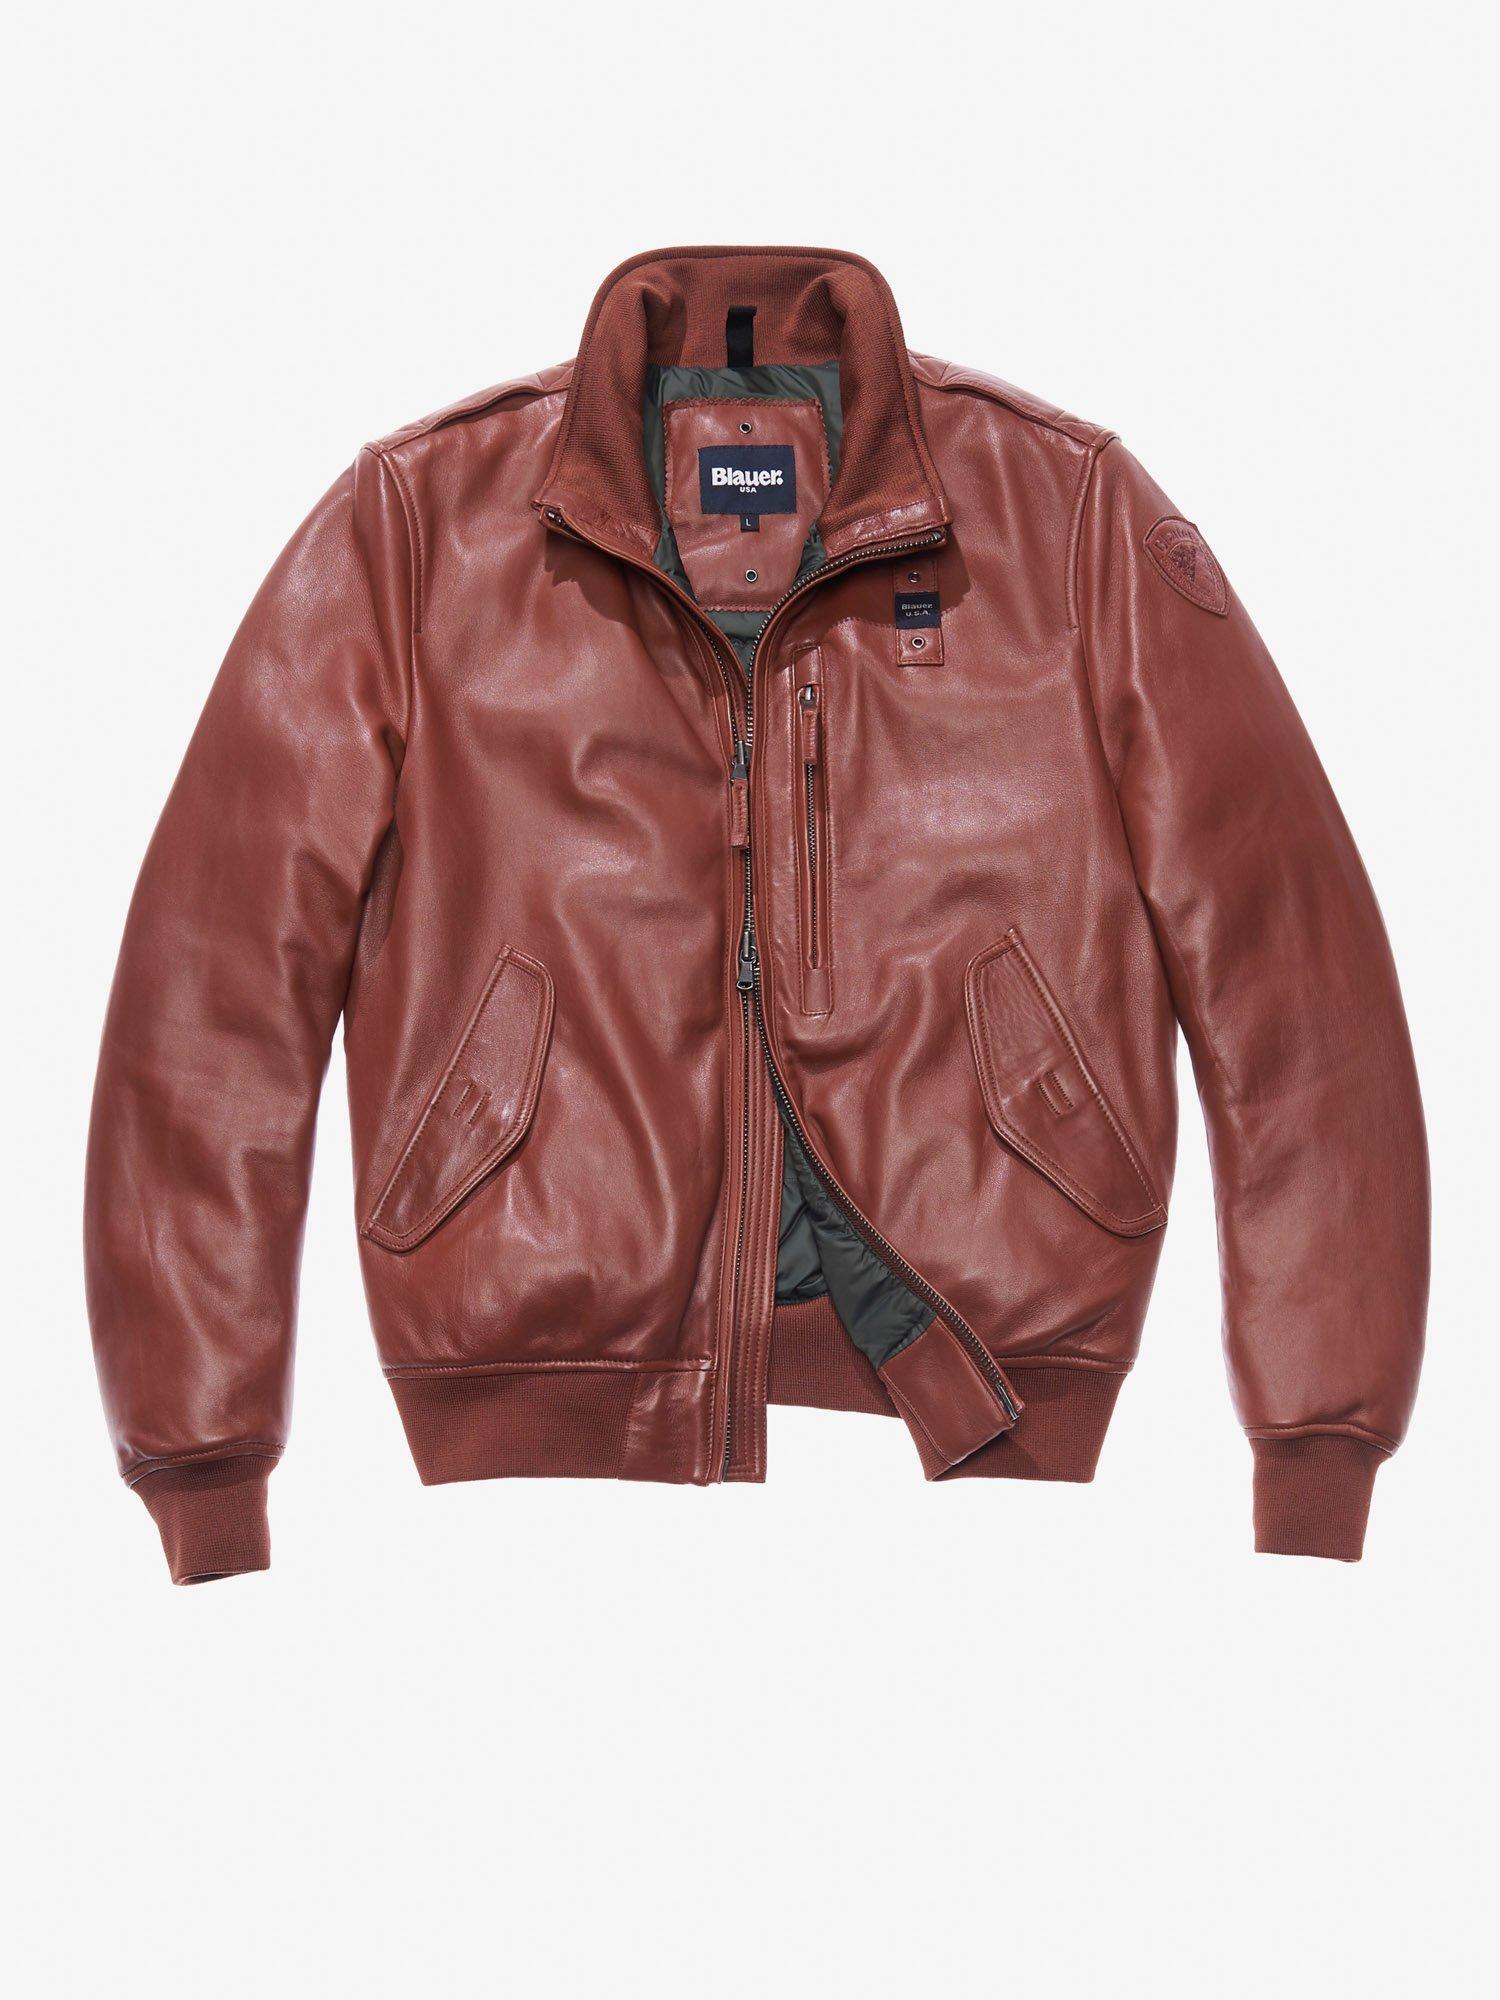 Giacche Giubbotti Uomo ® Pelle Shop E Usa Blauer Online aaq5Hr